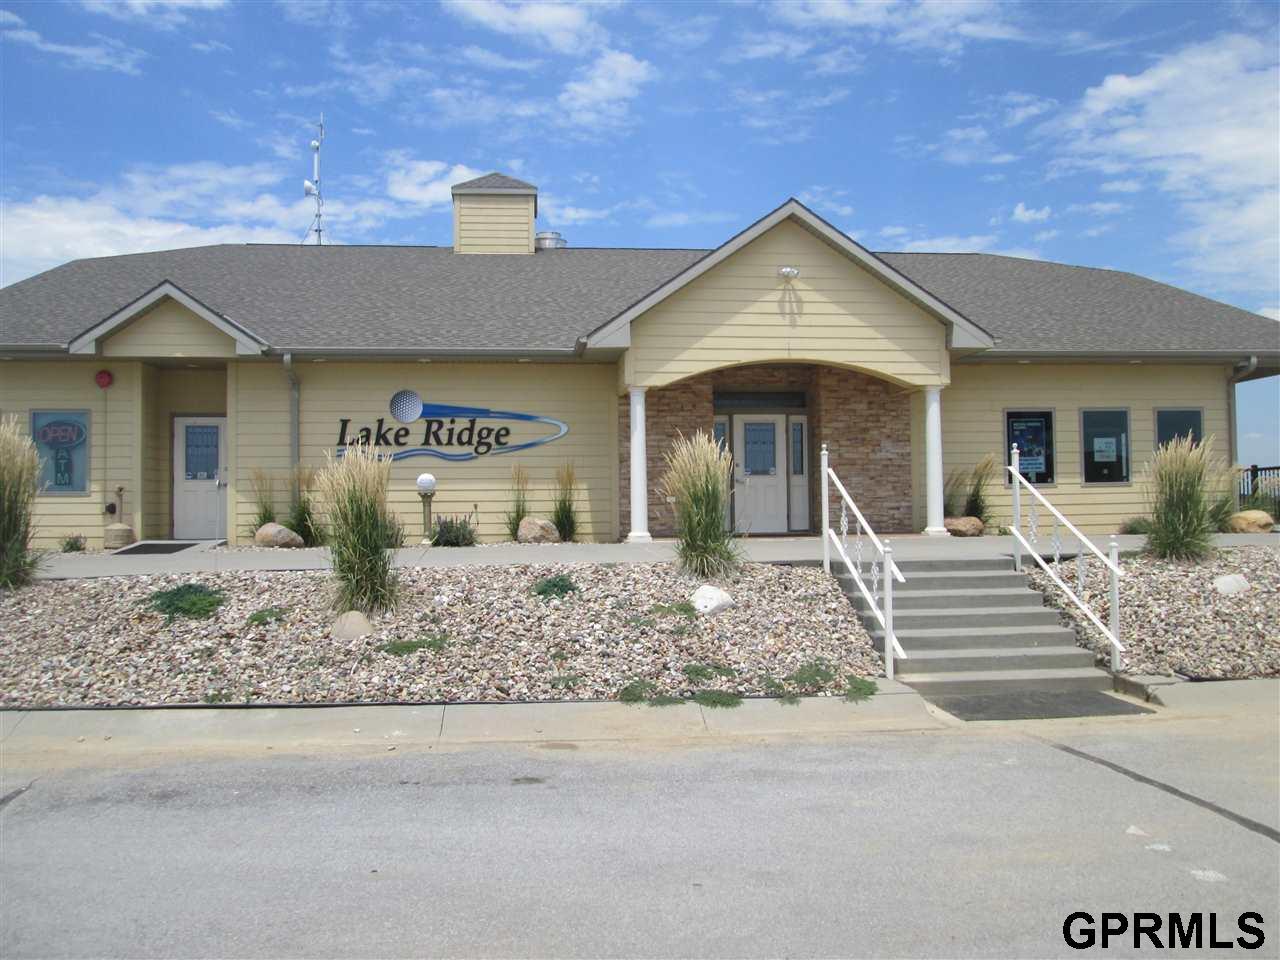 8642 Lakeridge Drive, Plattsmouth NE 68048 - Photo 1